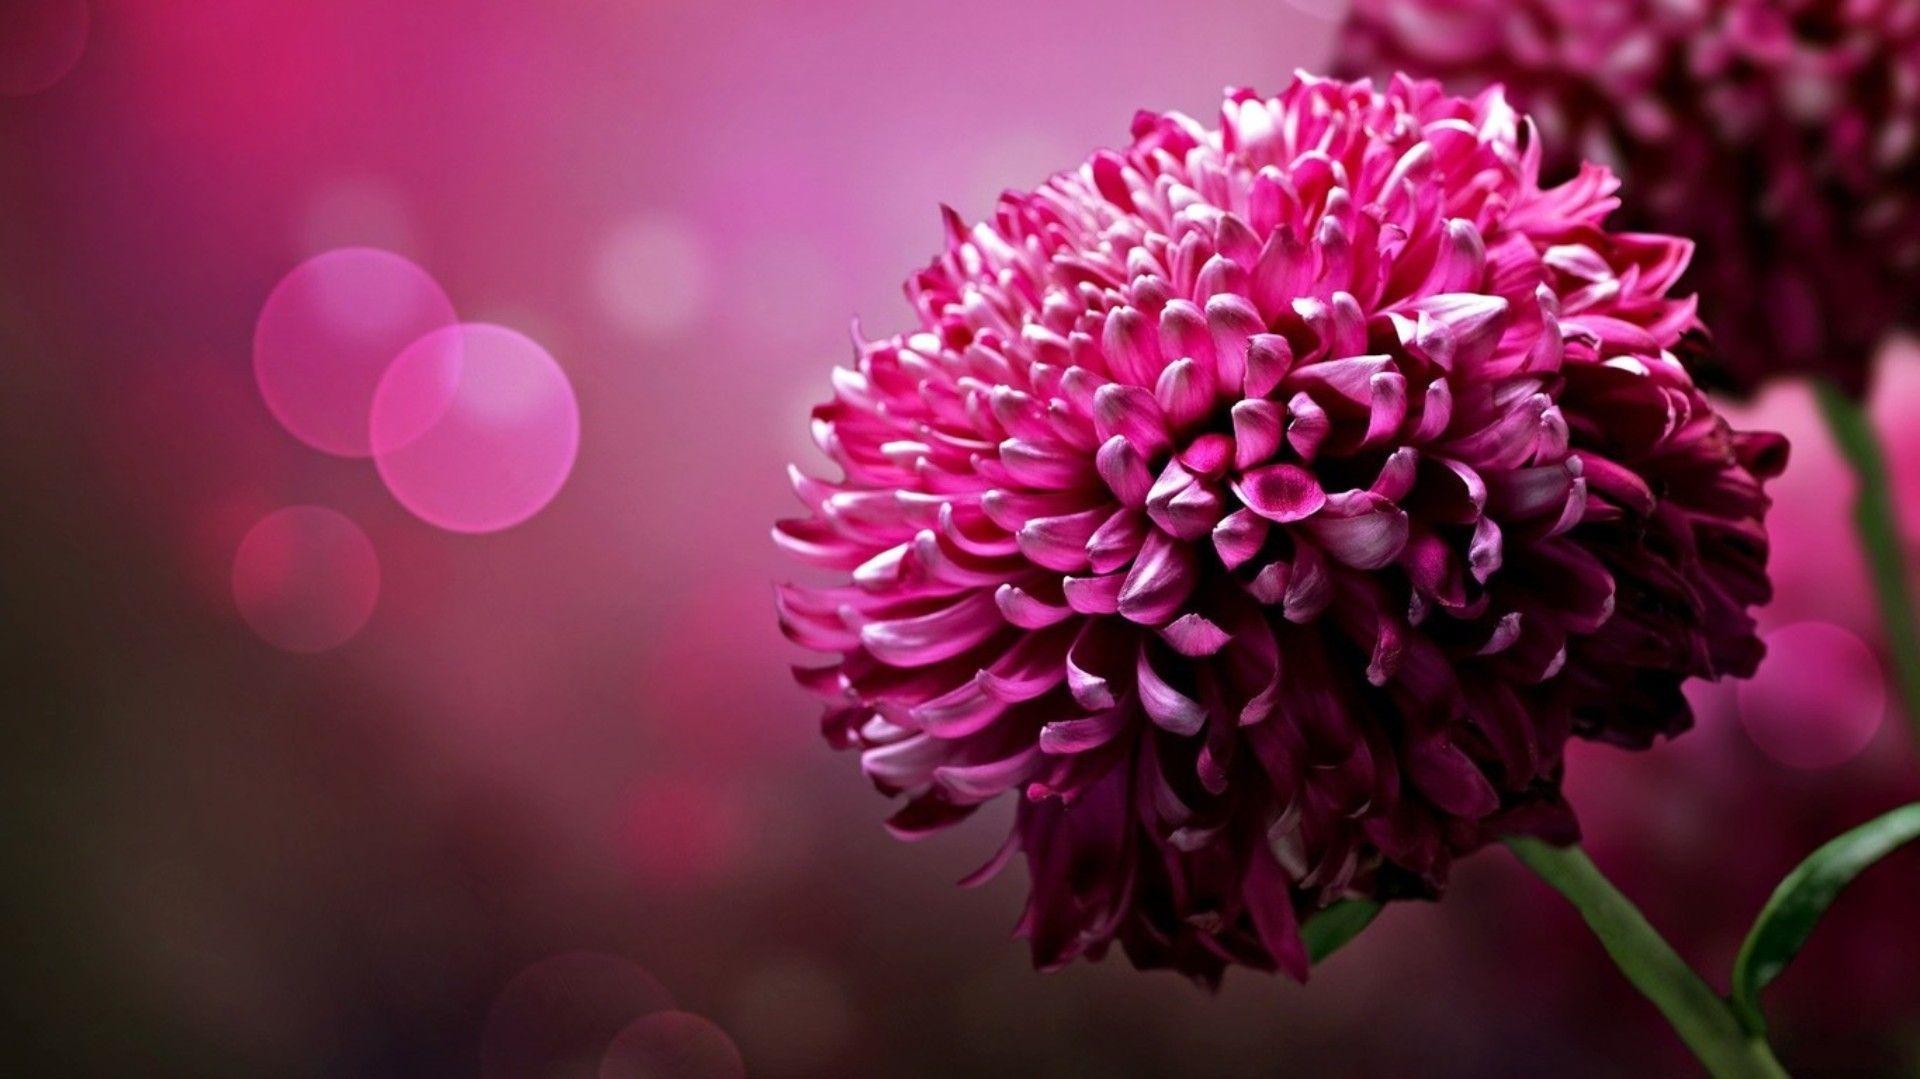 3d Flower Background Wallpaper Free Download Backgrounds Arriere